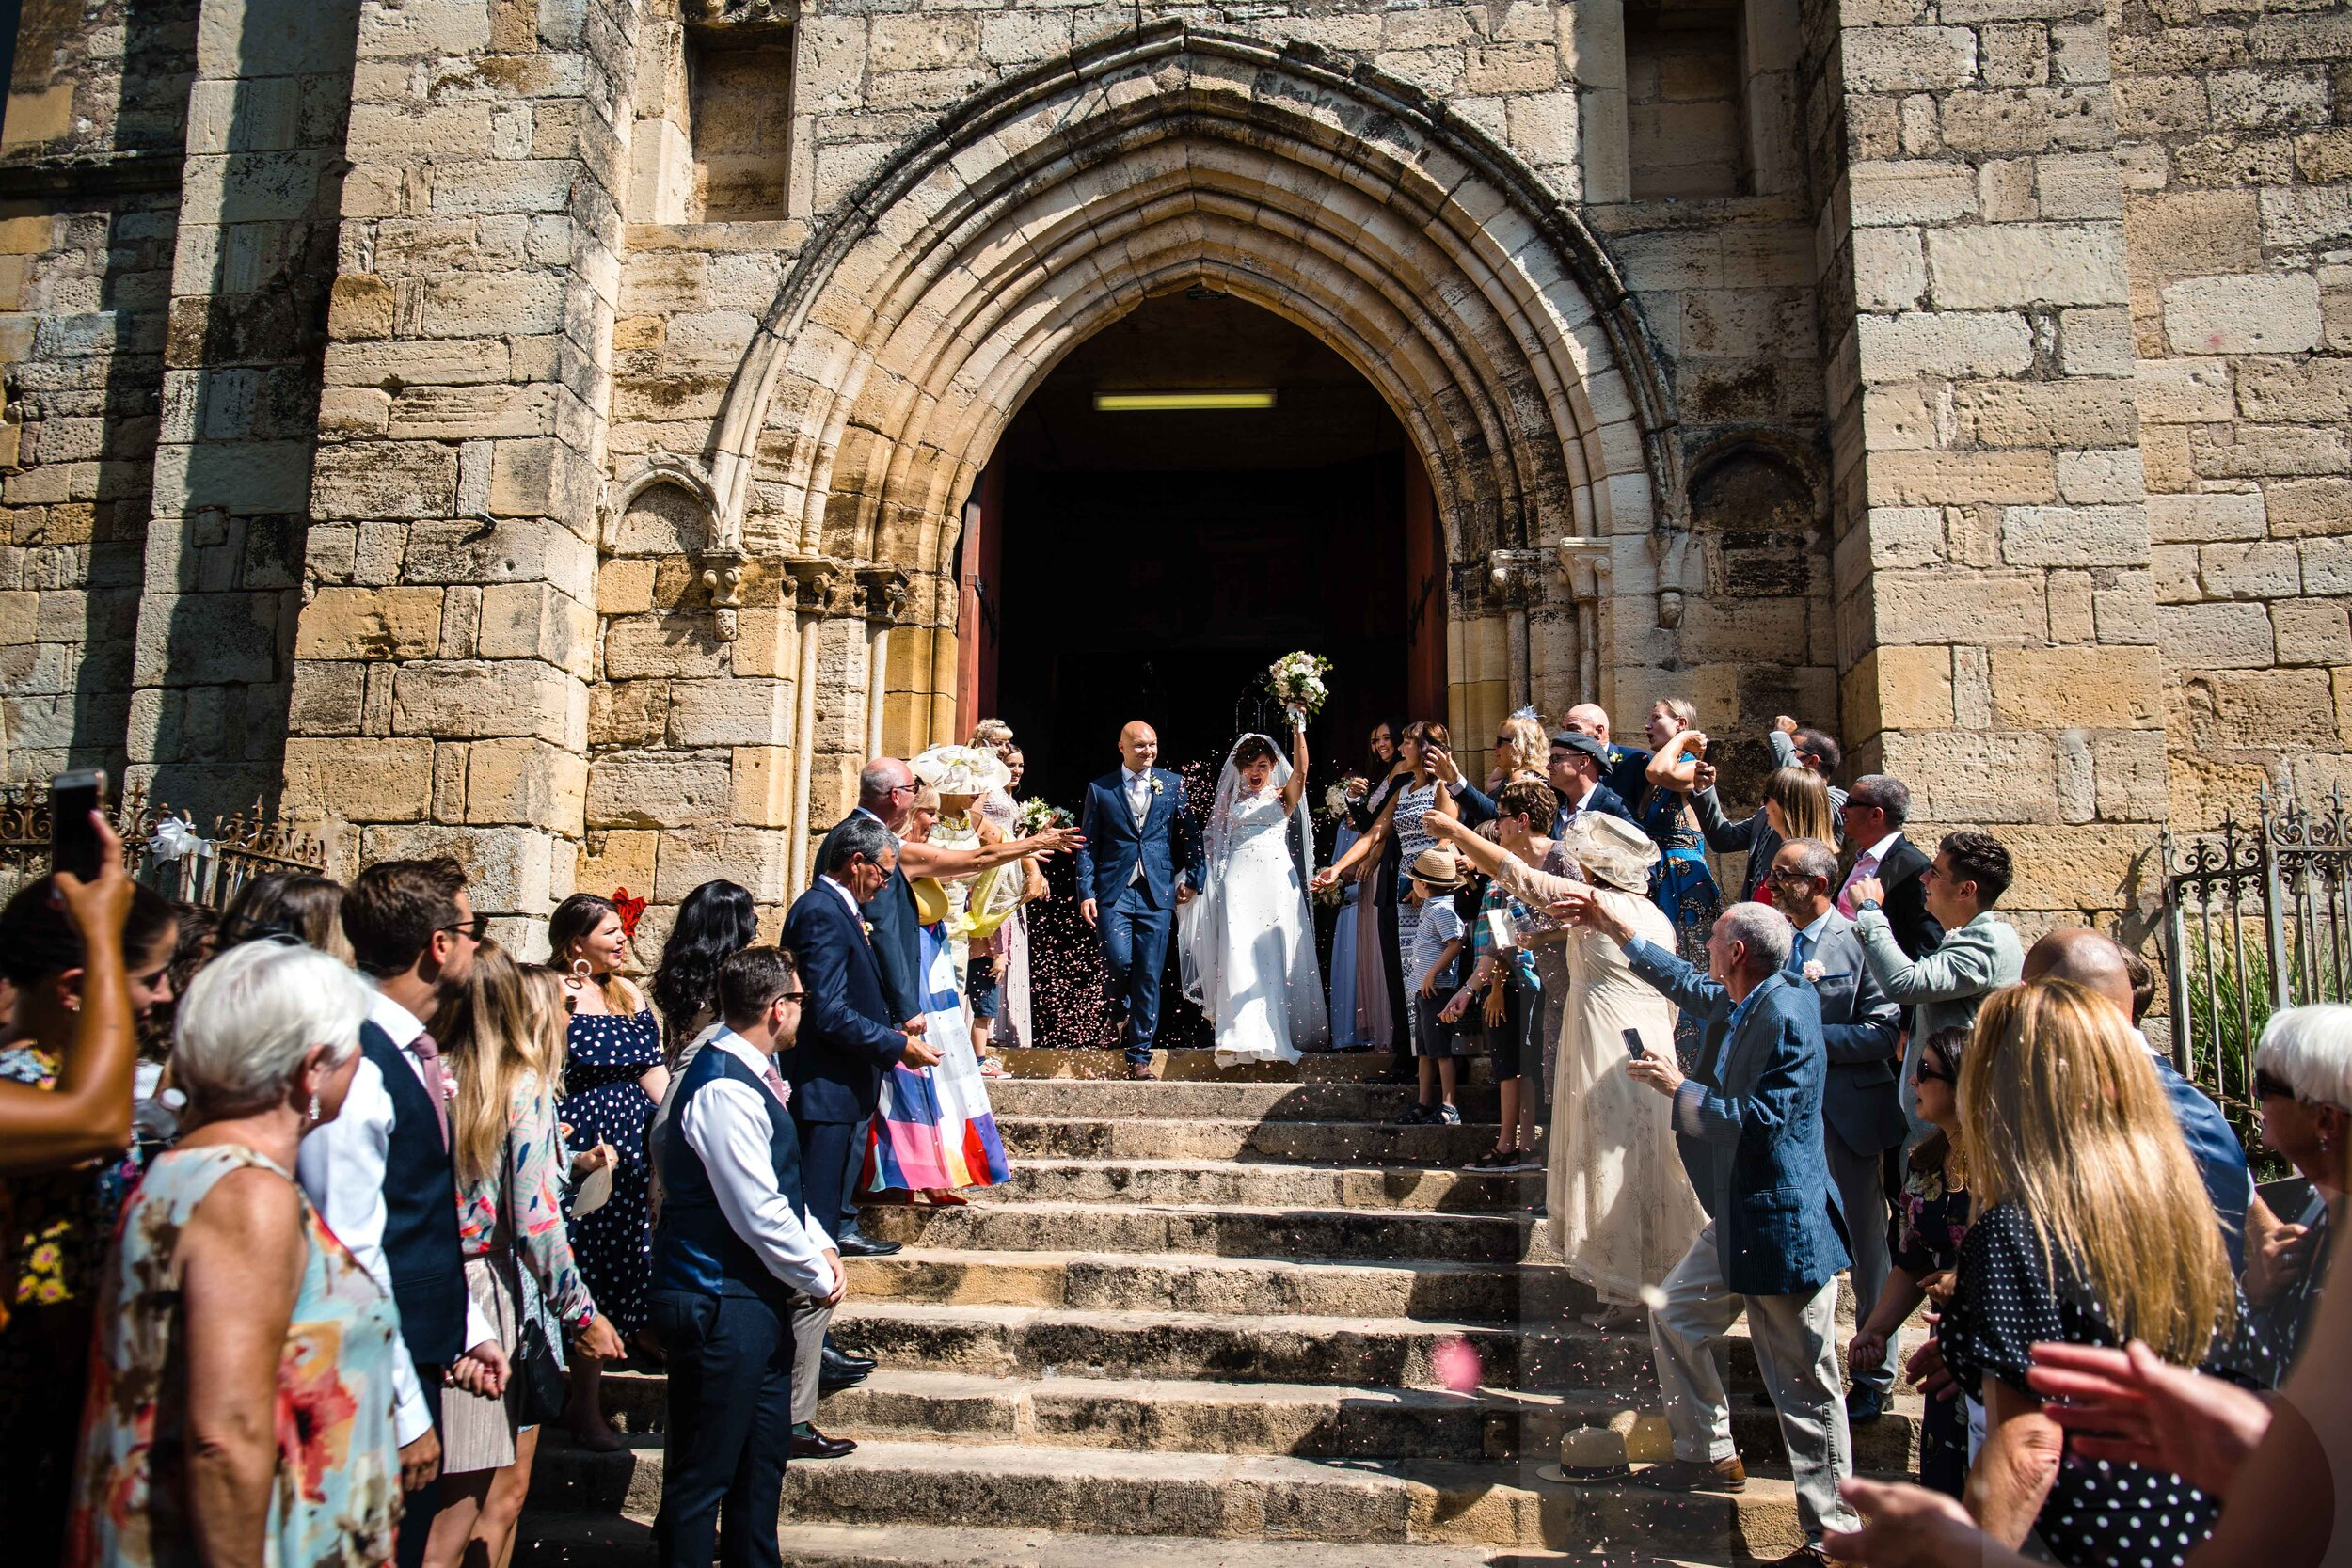 Chateau-la-Durantie-wedding-photography-2.jpg